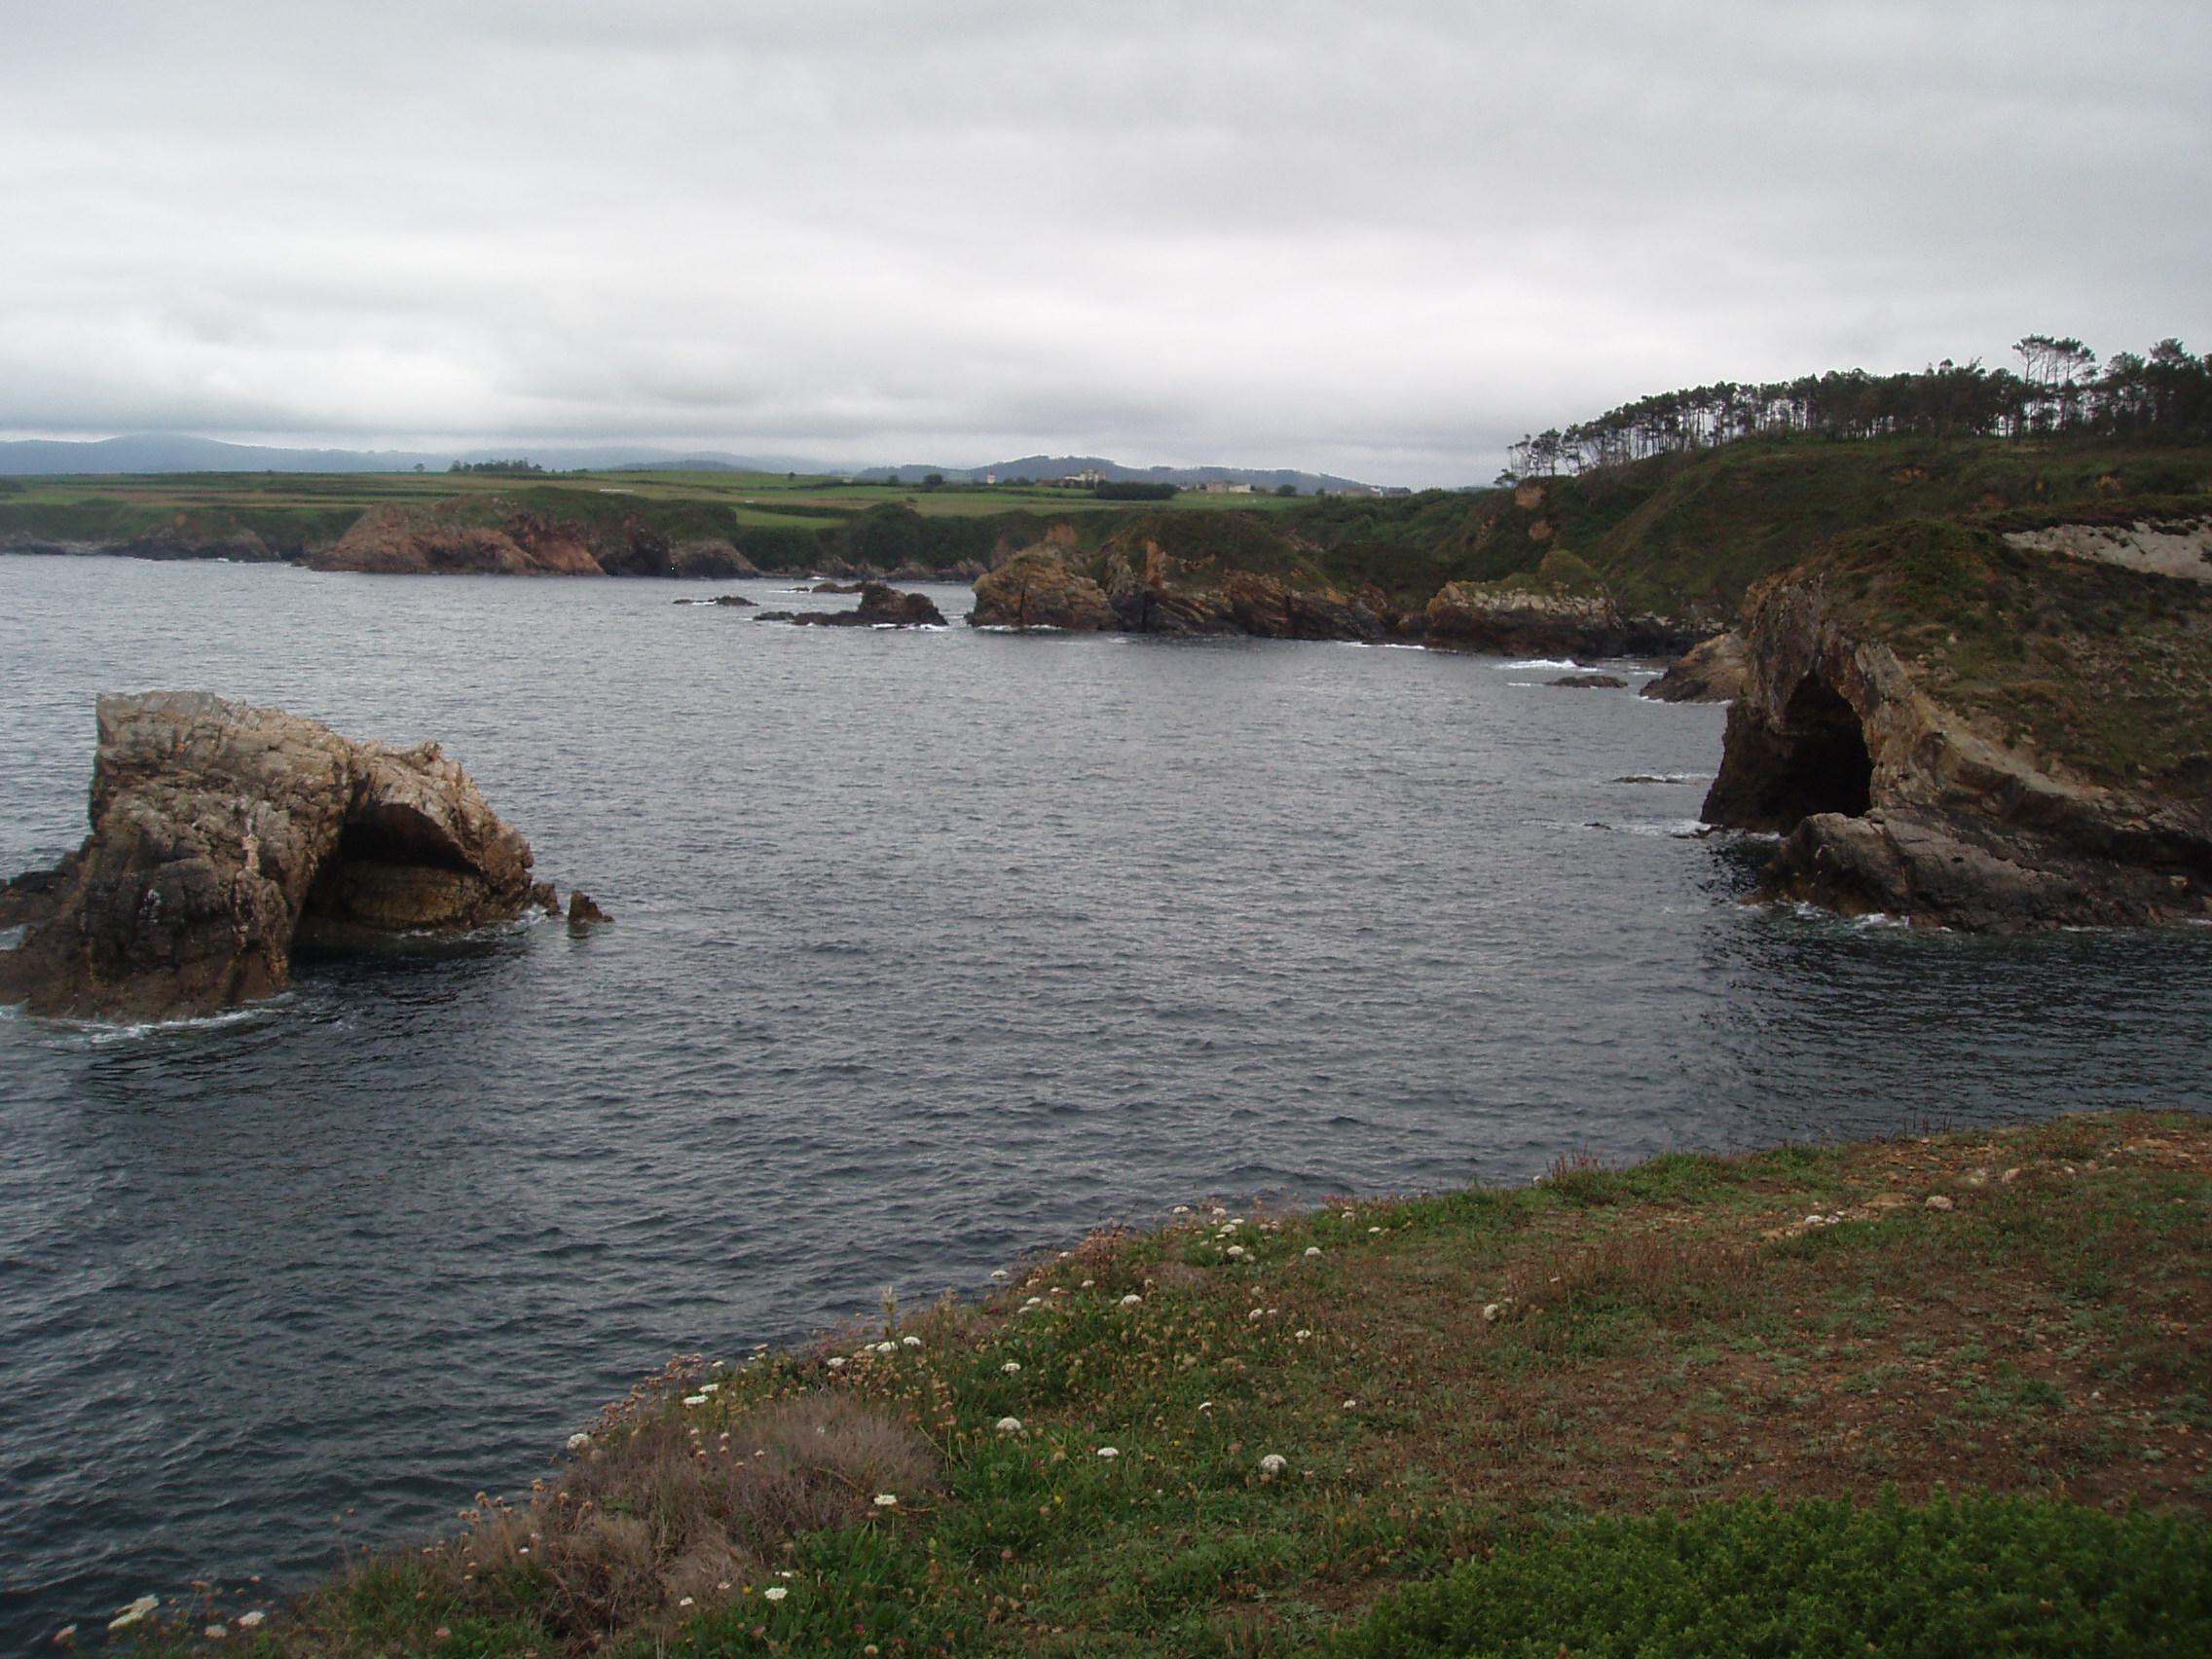 Playa Porcia